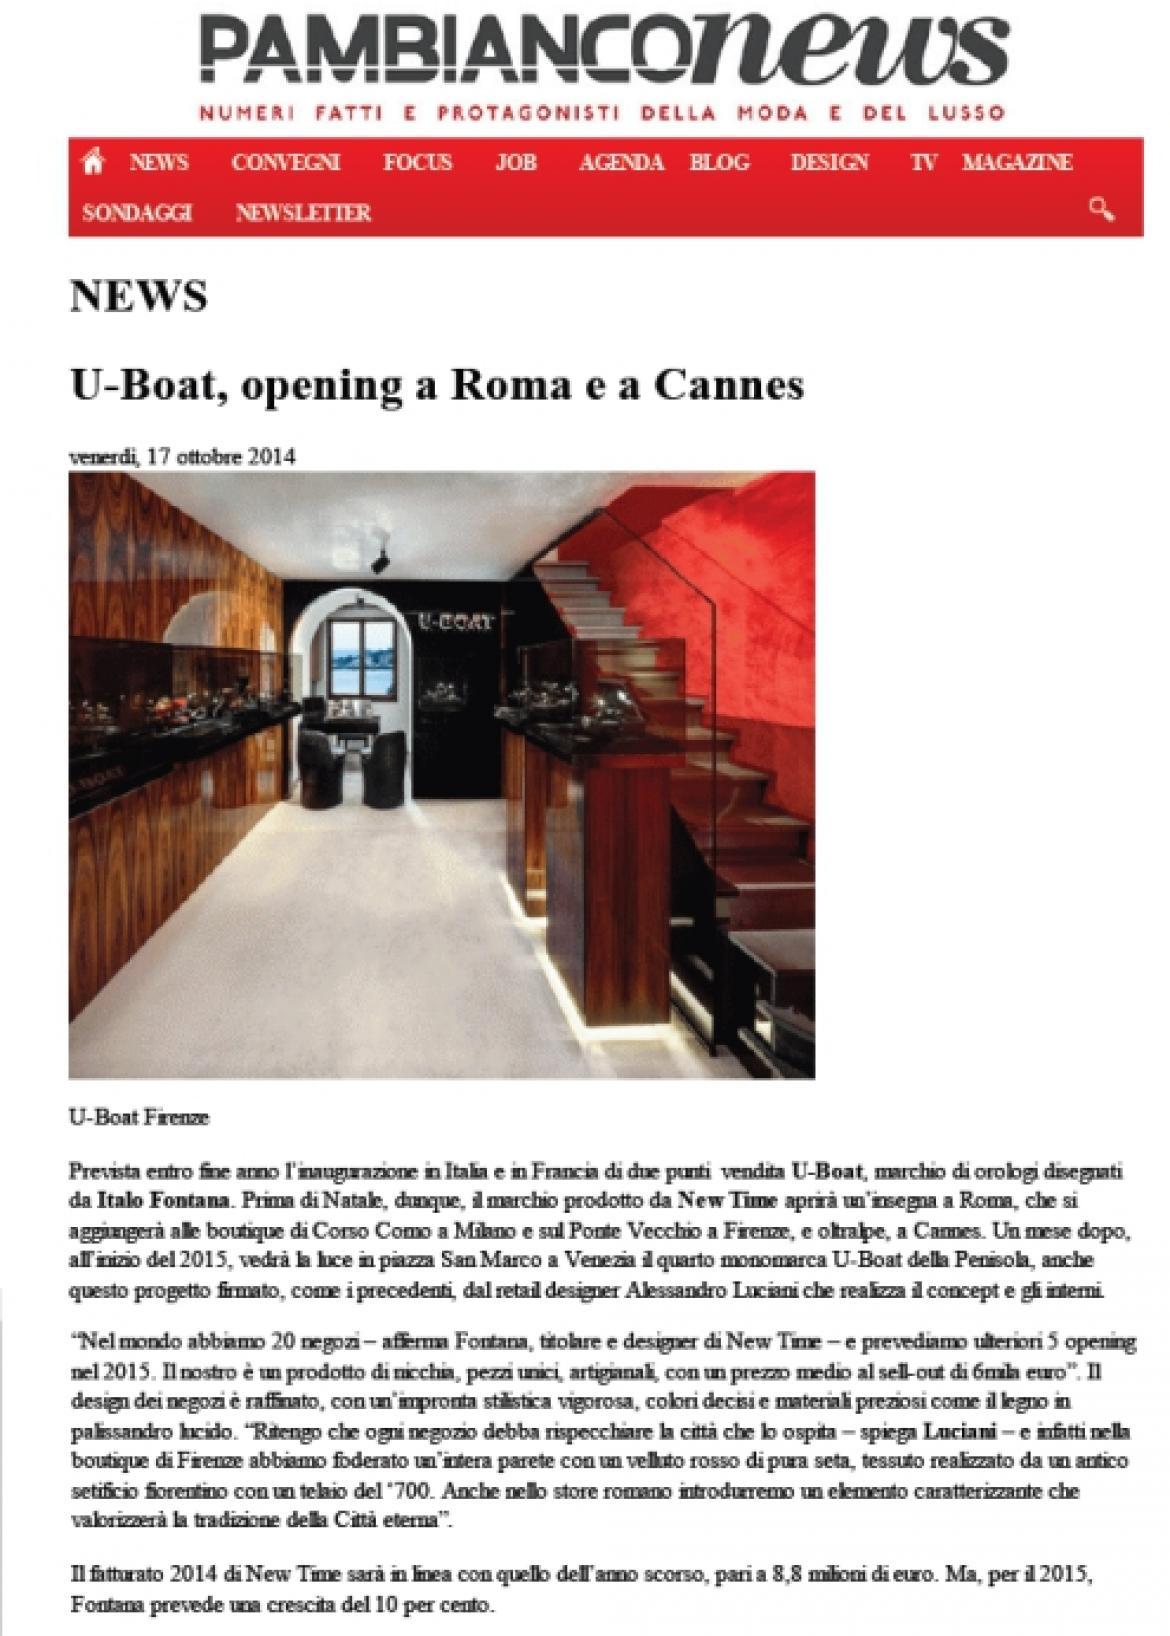 Pambianco News Alessandro Luciani